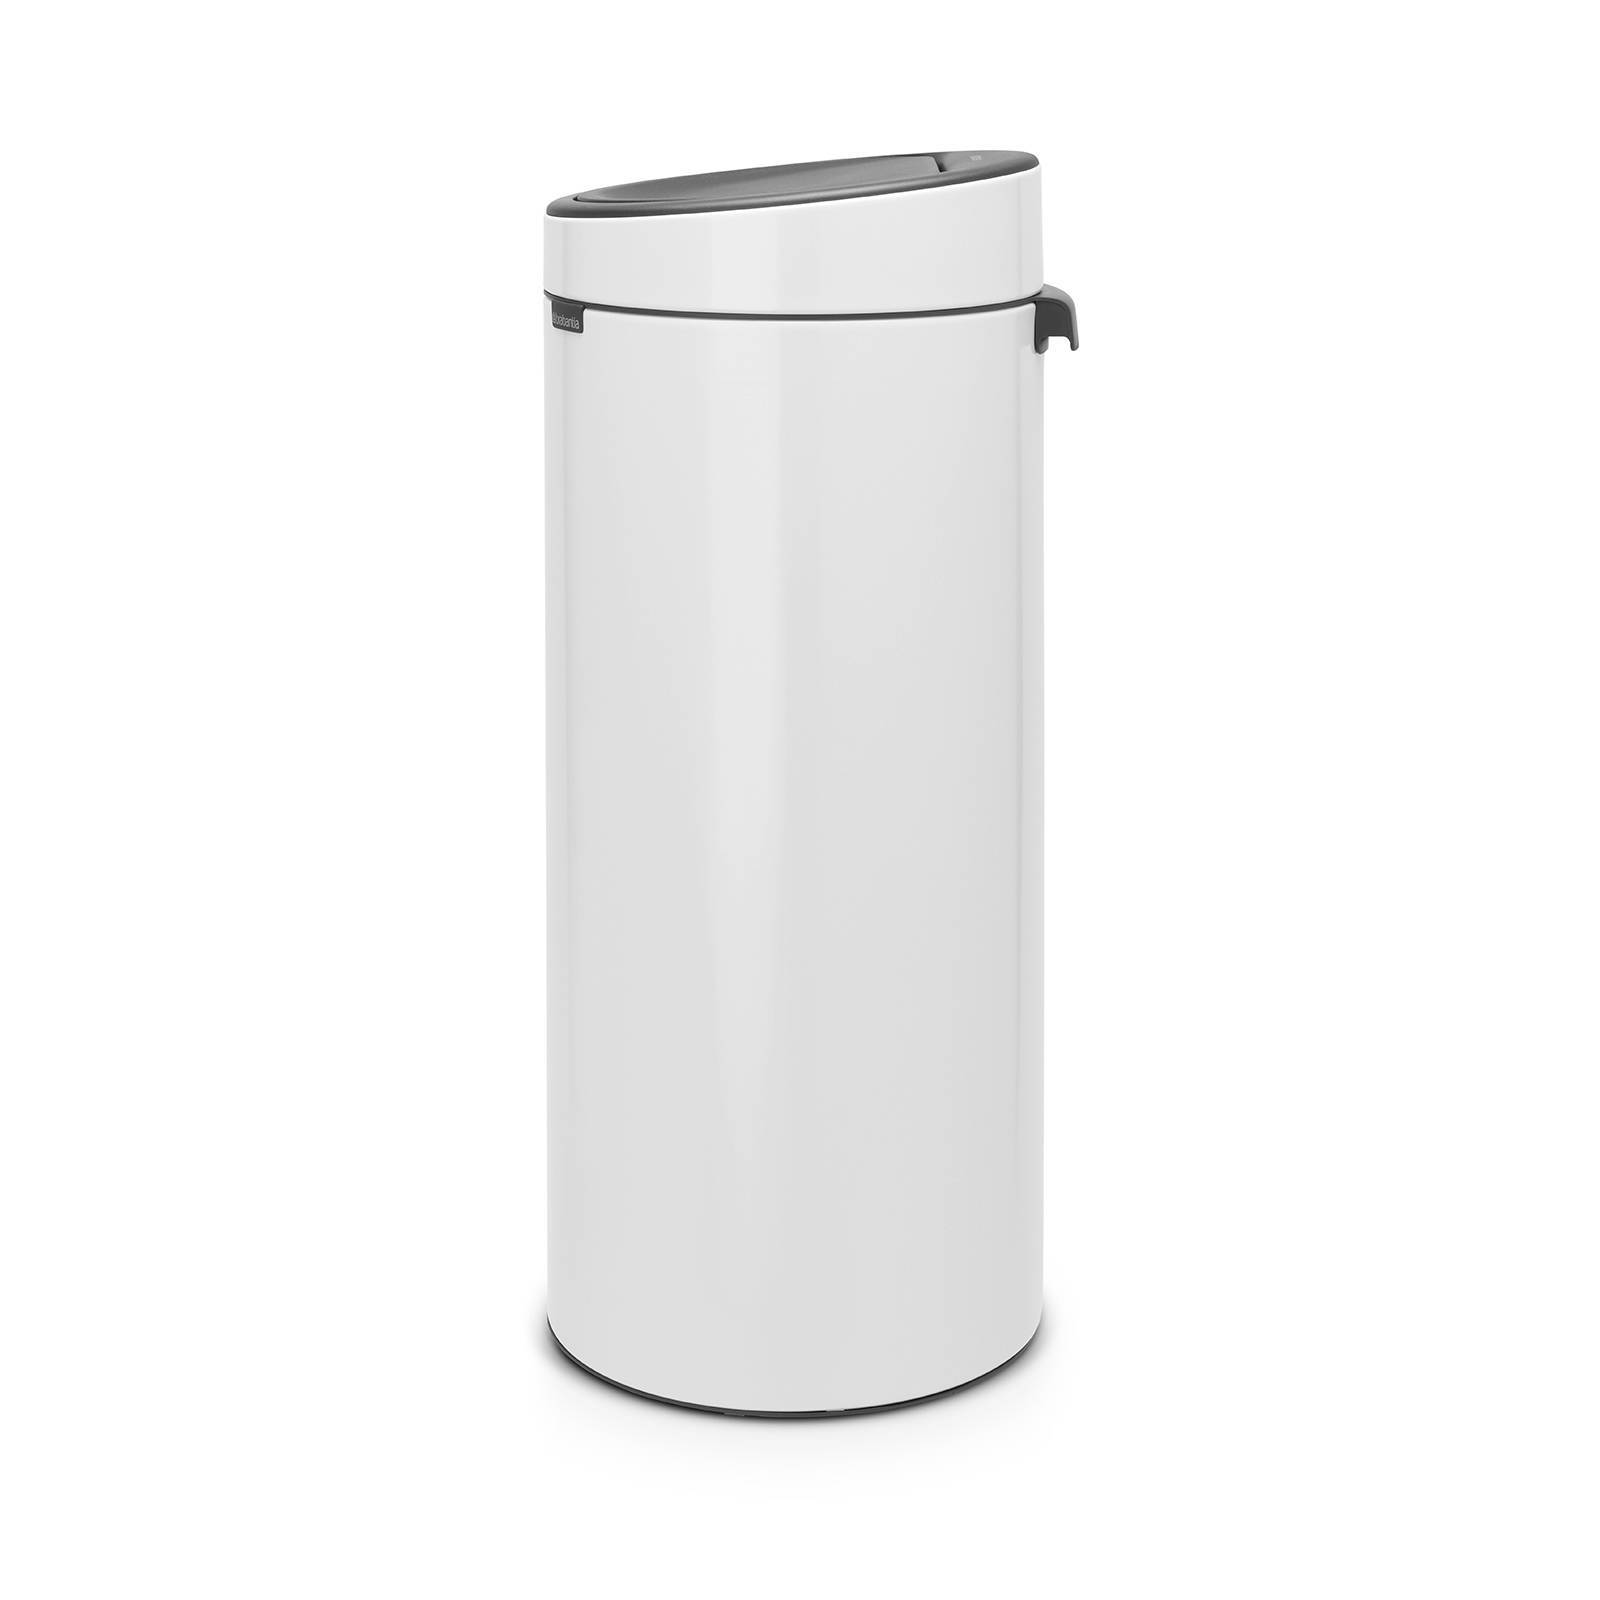 Brabantia Touch Bin 30 Liter Wit.Touch Bin 30 Liter Prullenbak